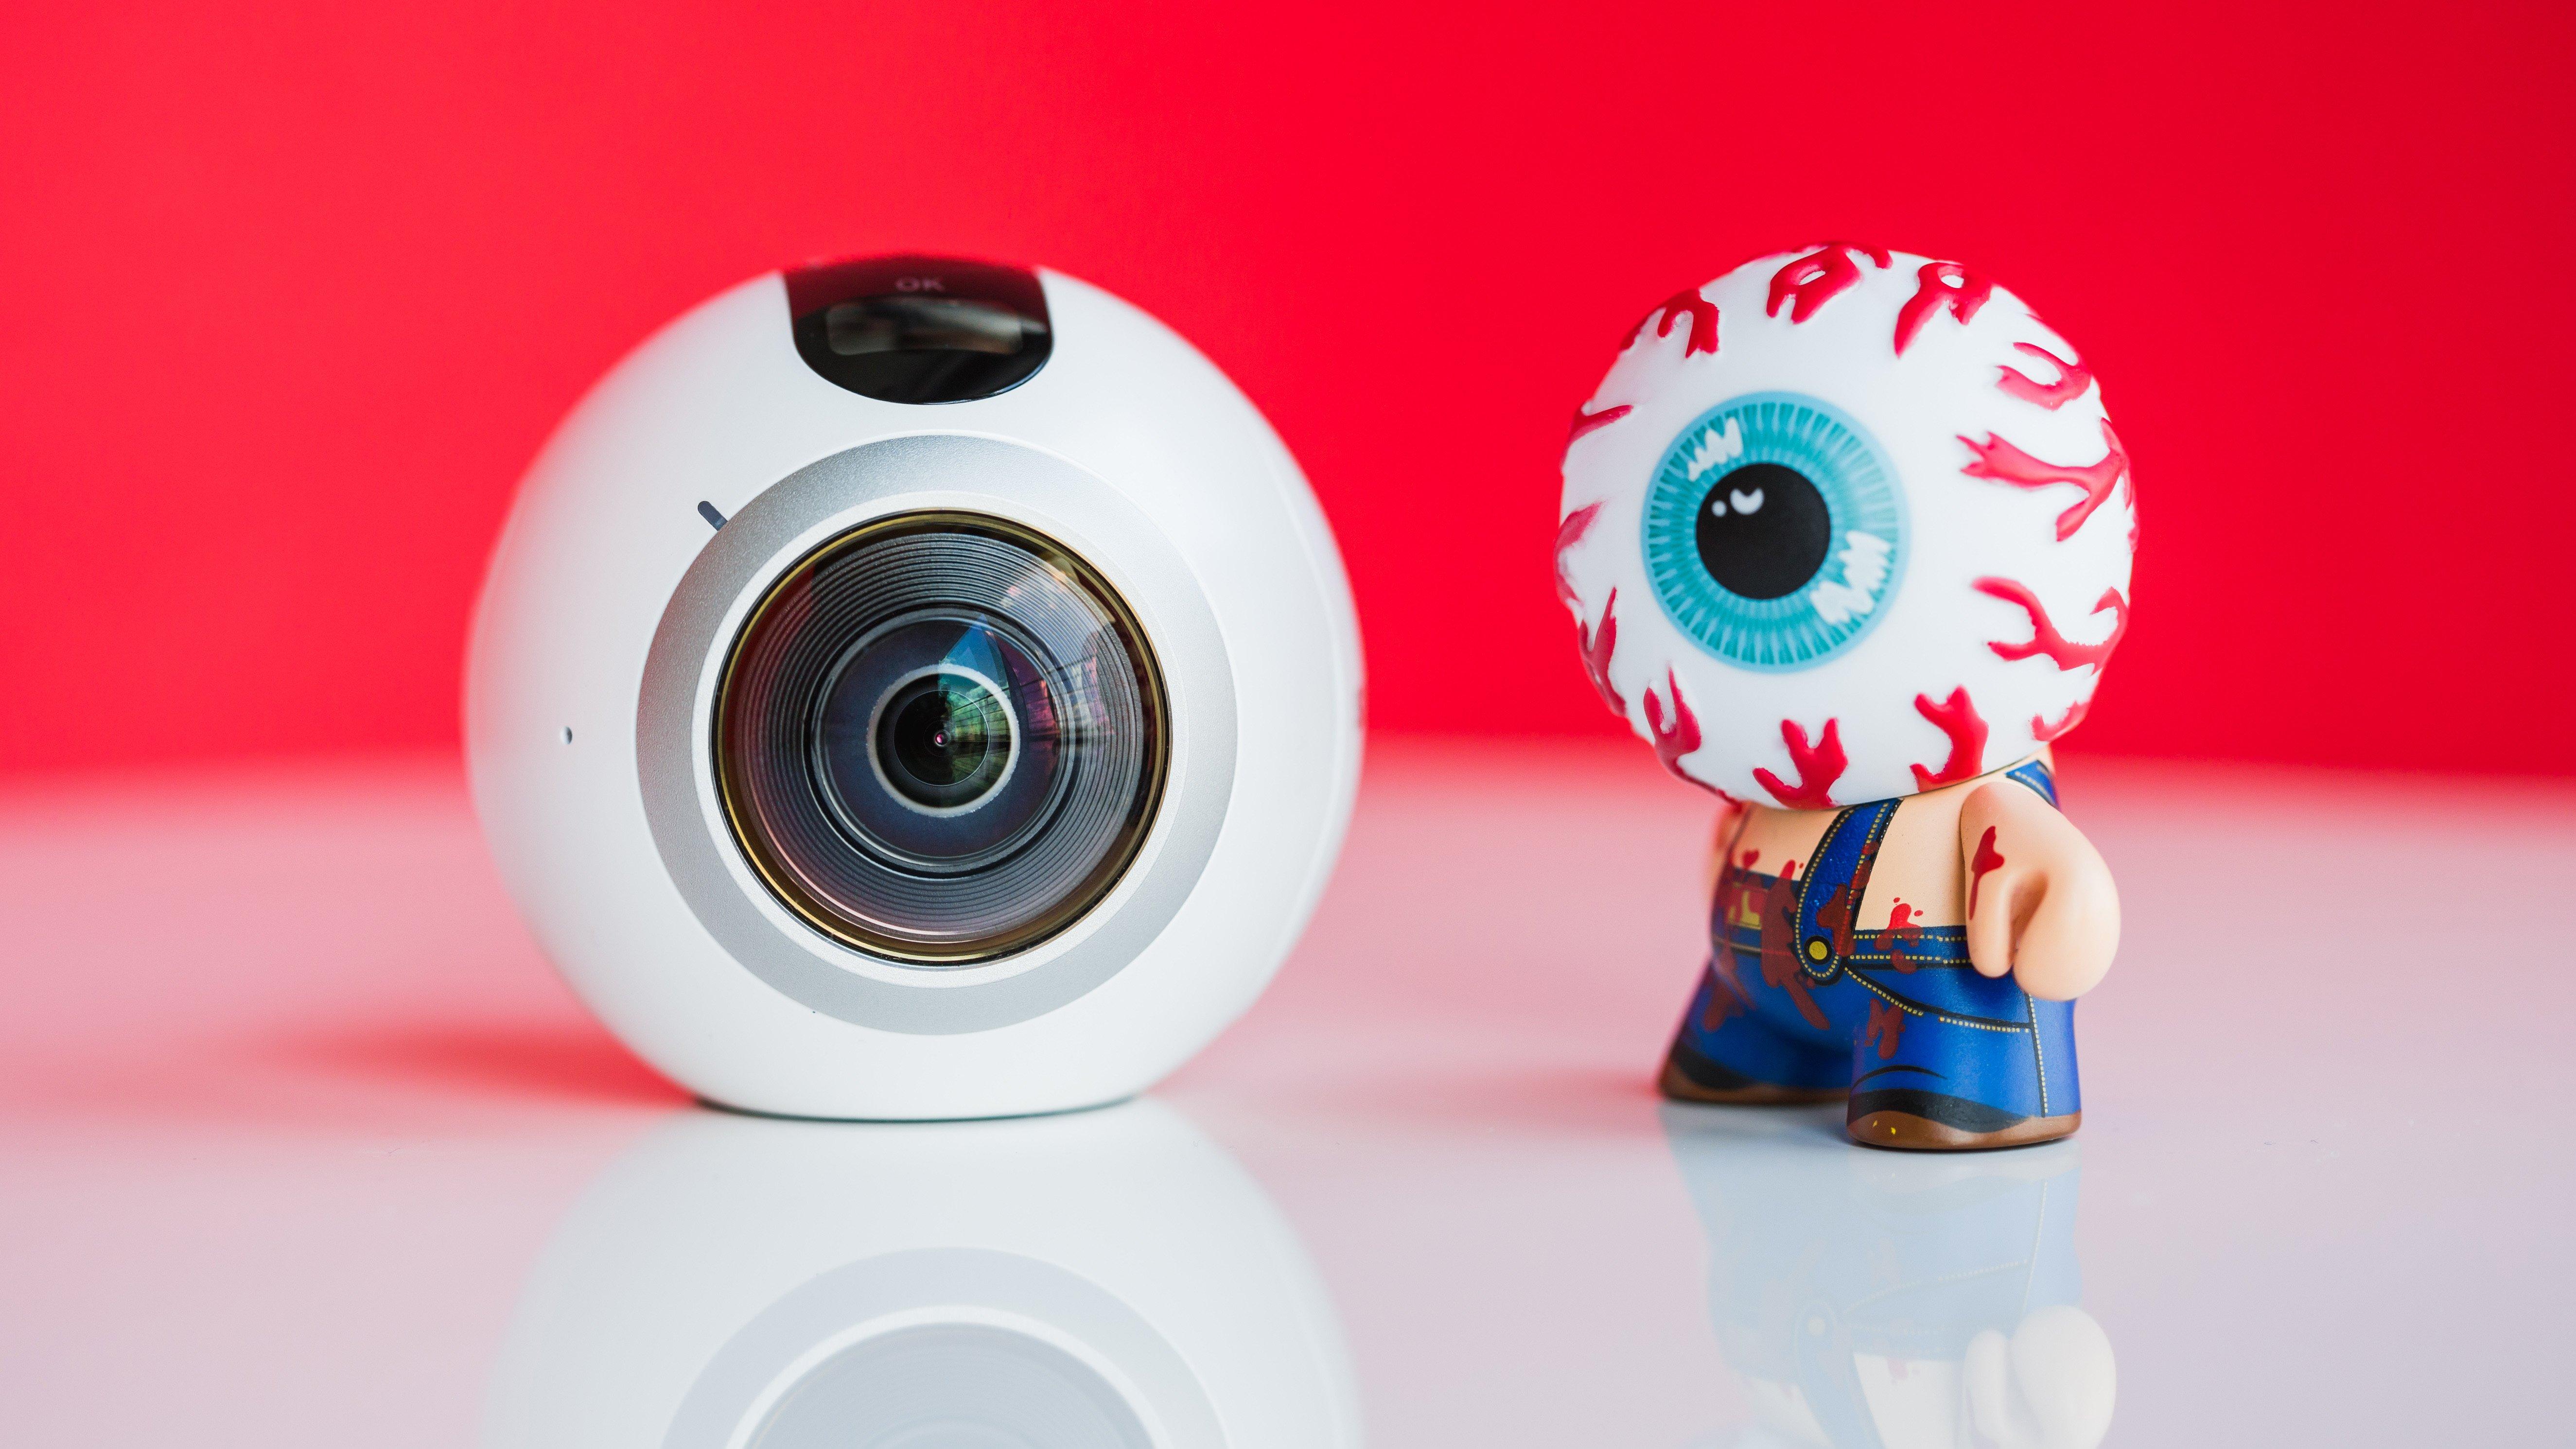 les meilleures cam ras 360 degr s samsung lg et d. Black Bedroom Furniture Sets. Home Design Ideas